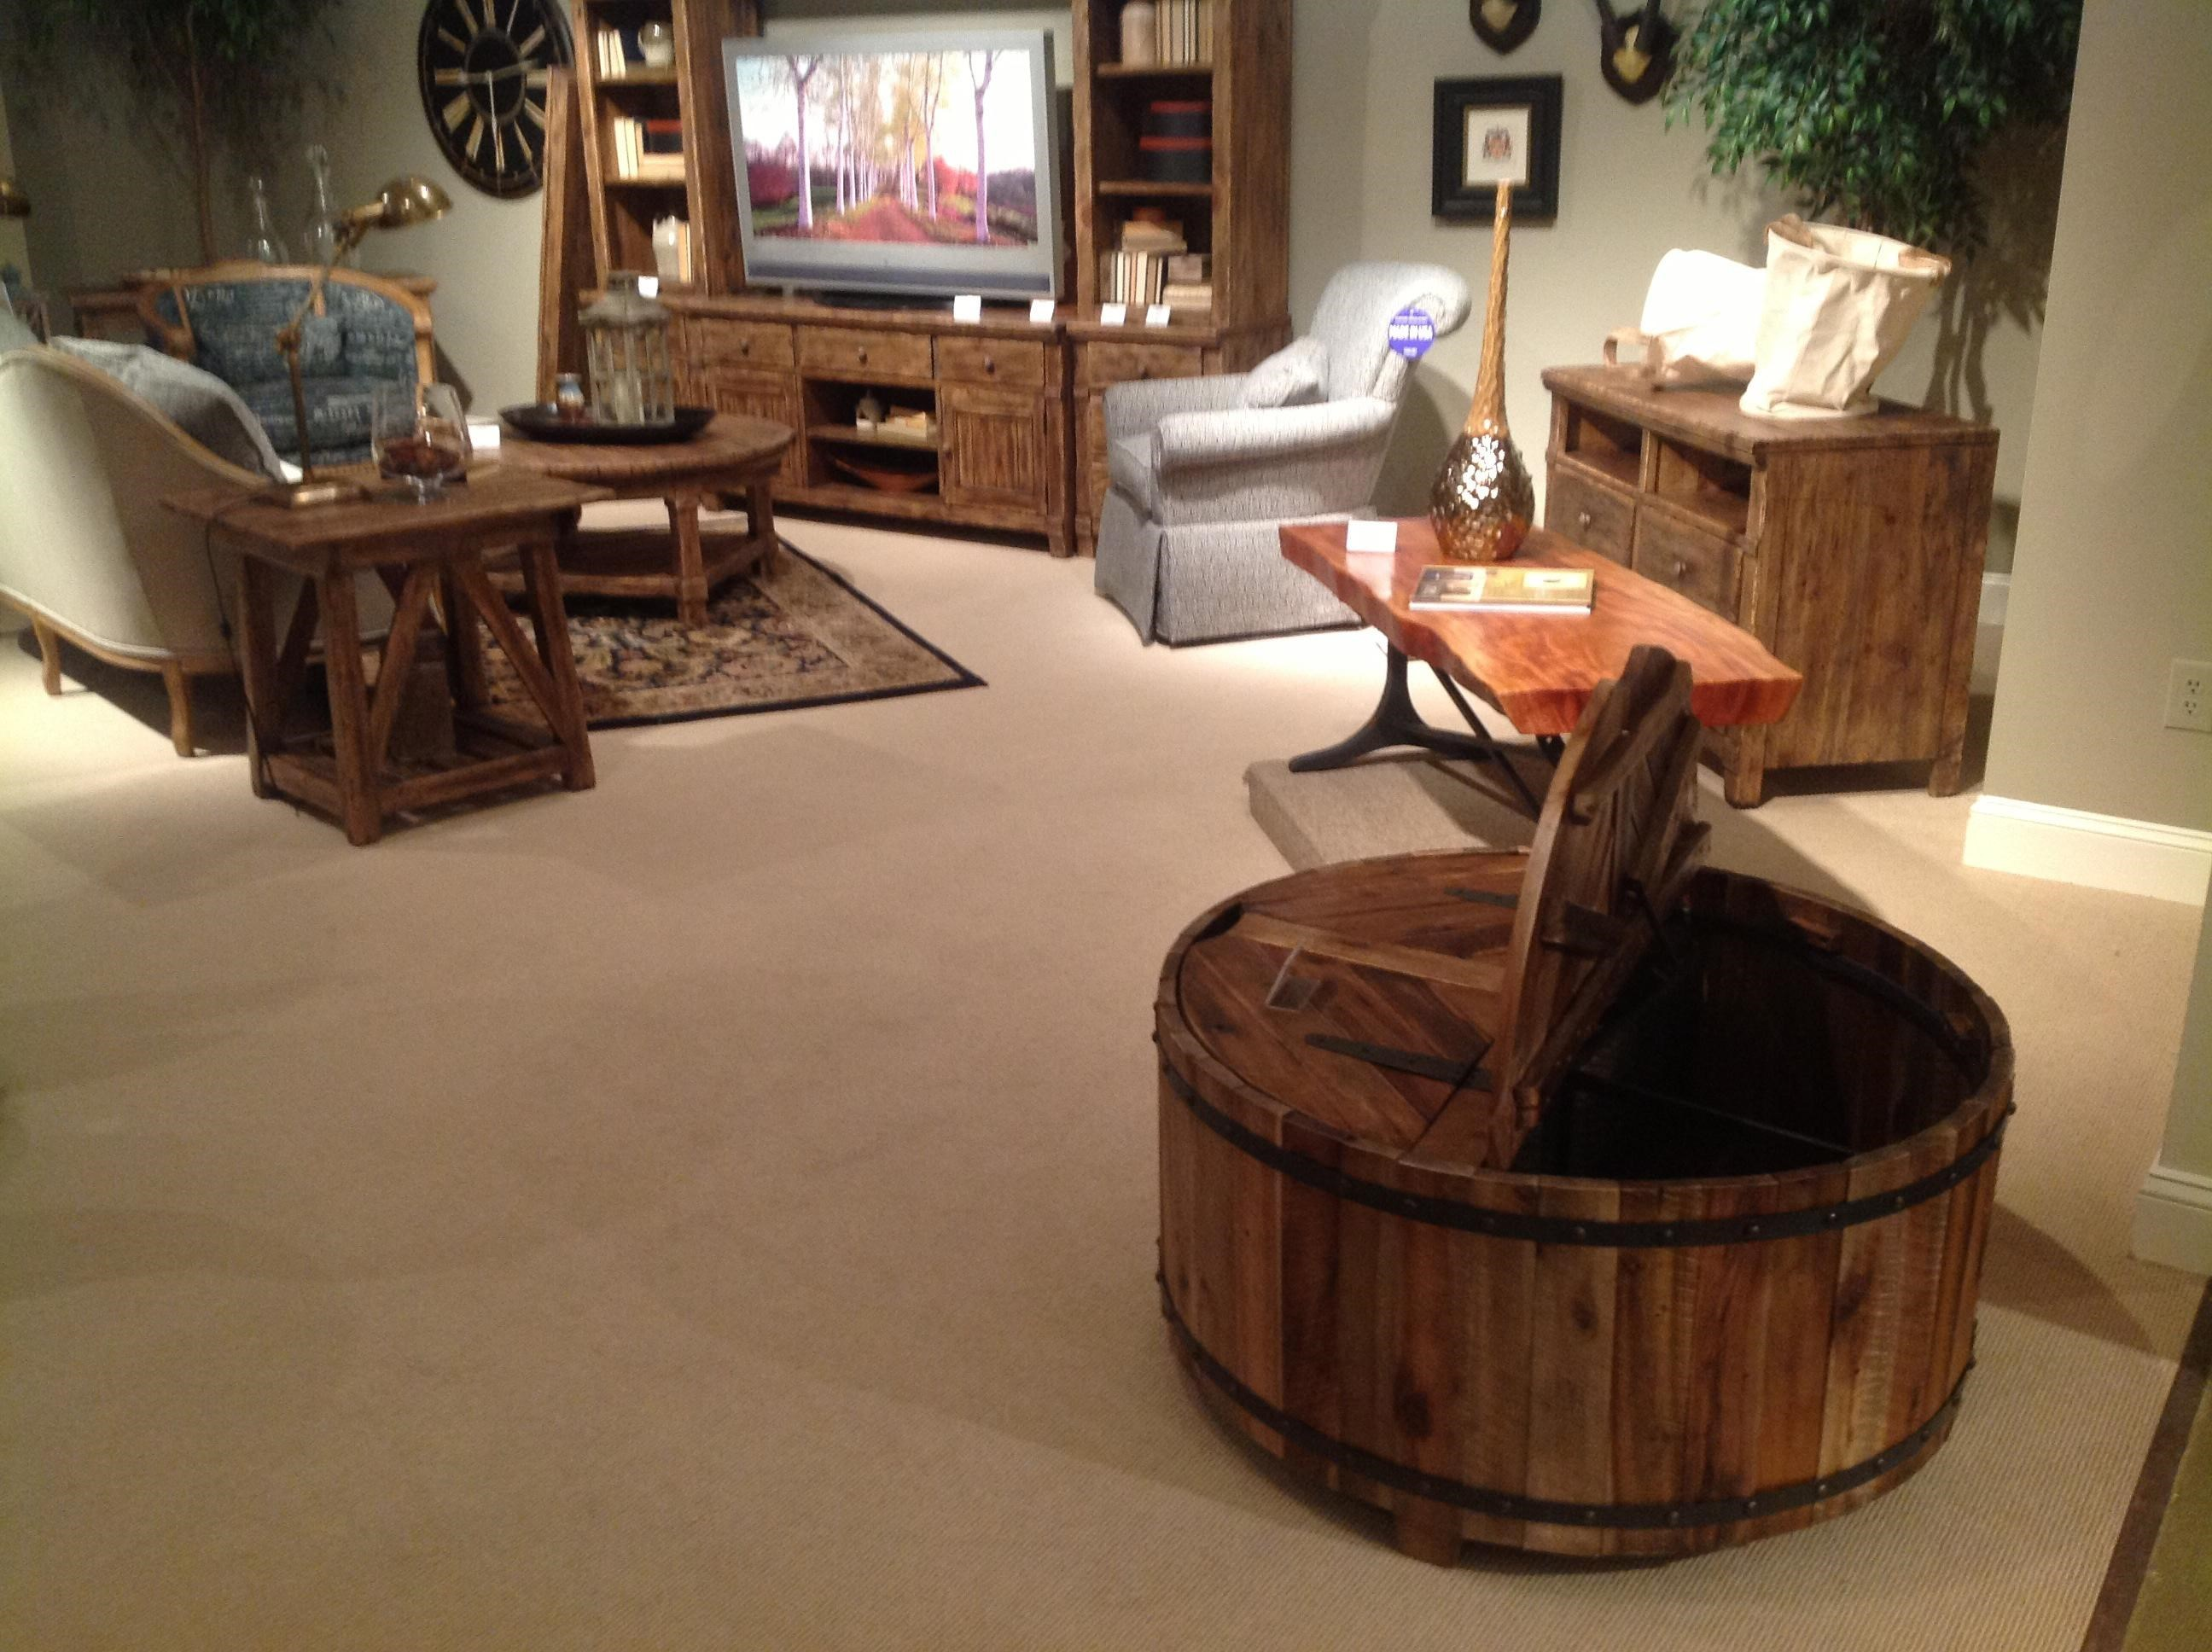 ... Kincaid Furniture Artisans Shoppe AccentsRound Cocktail Table